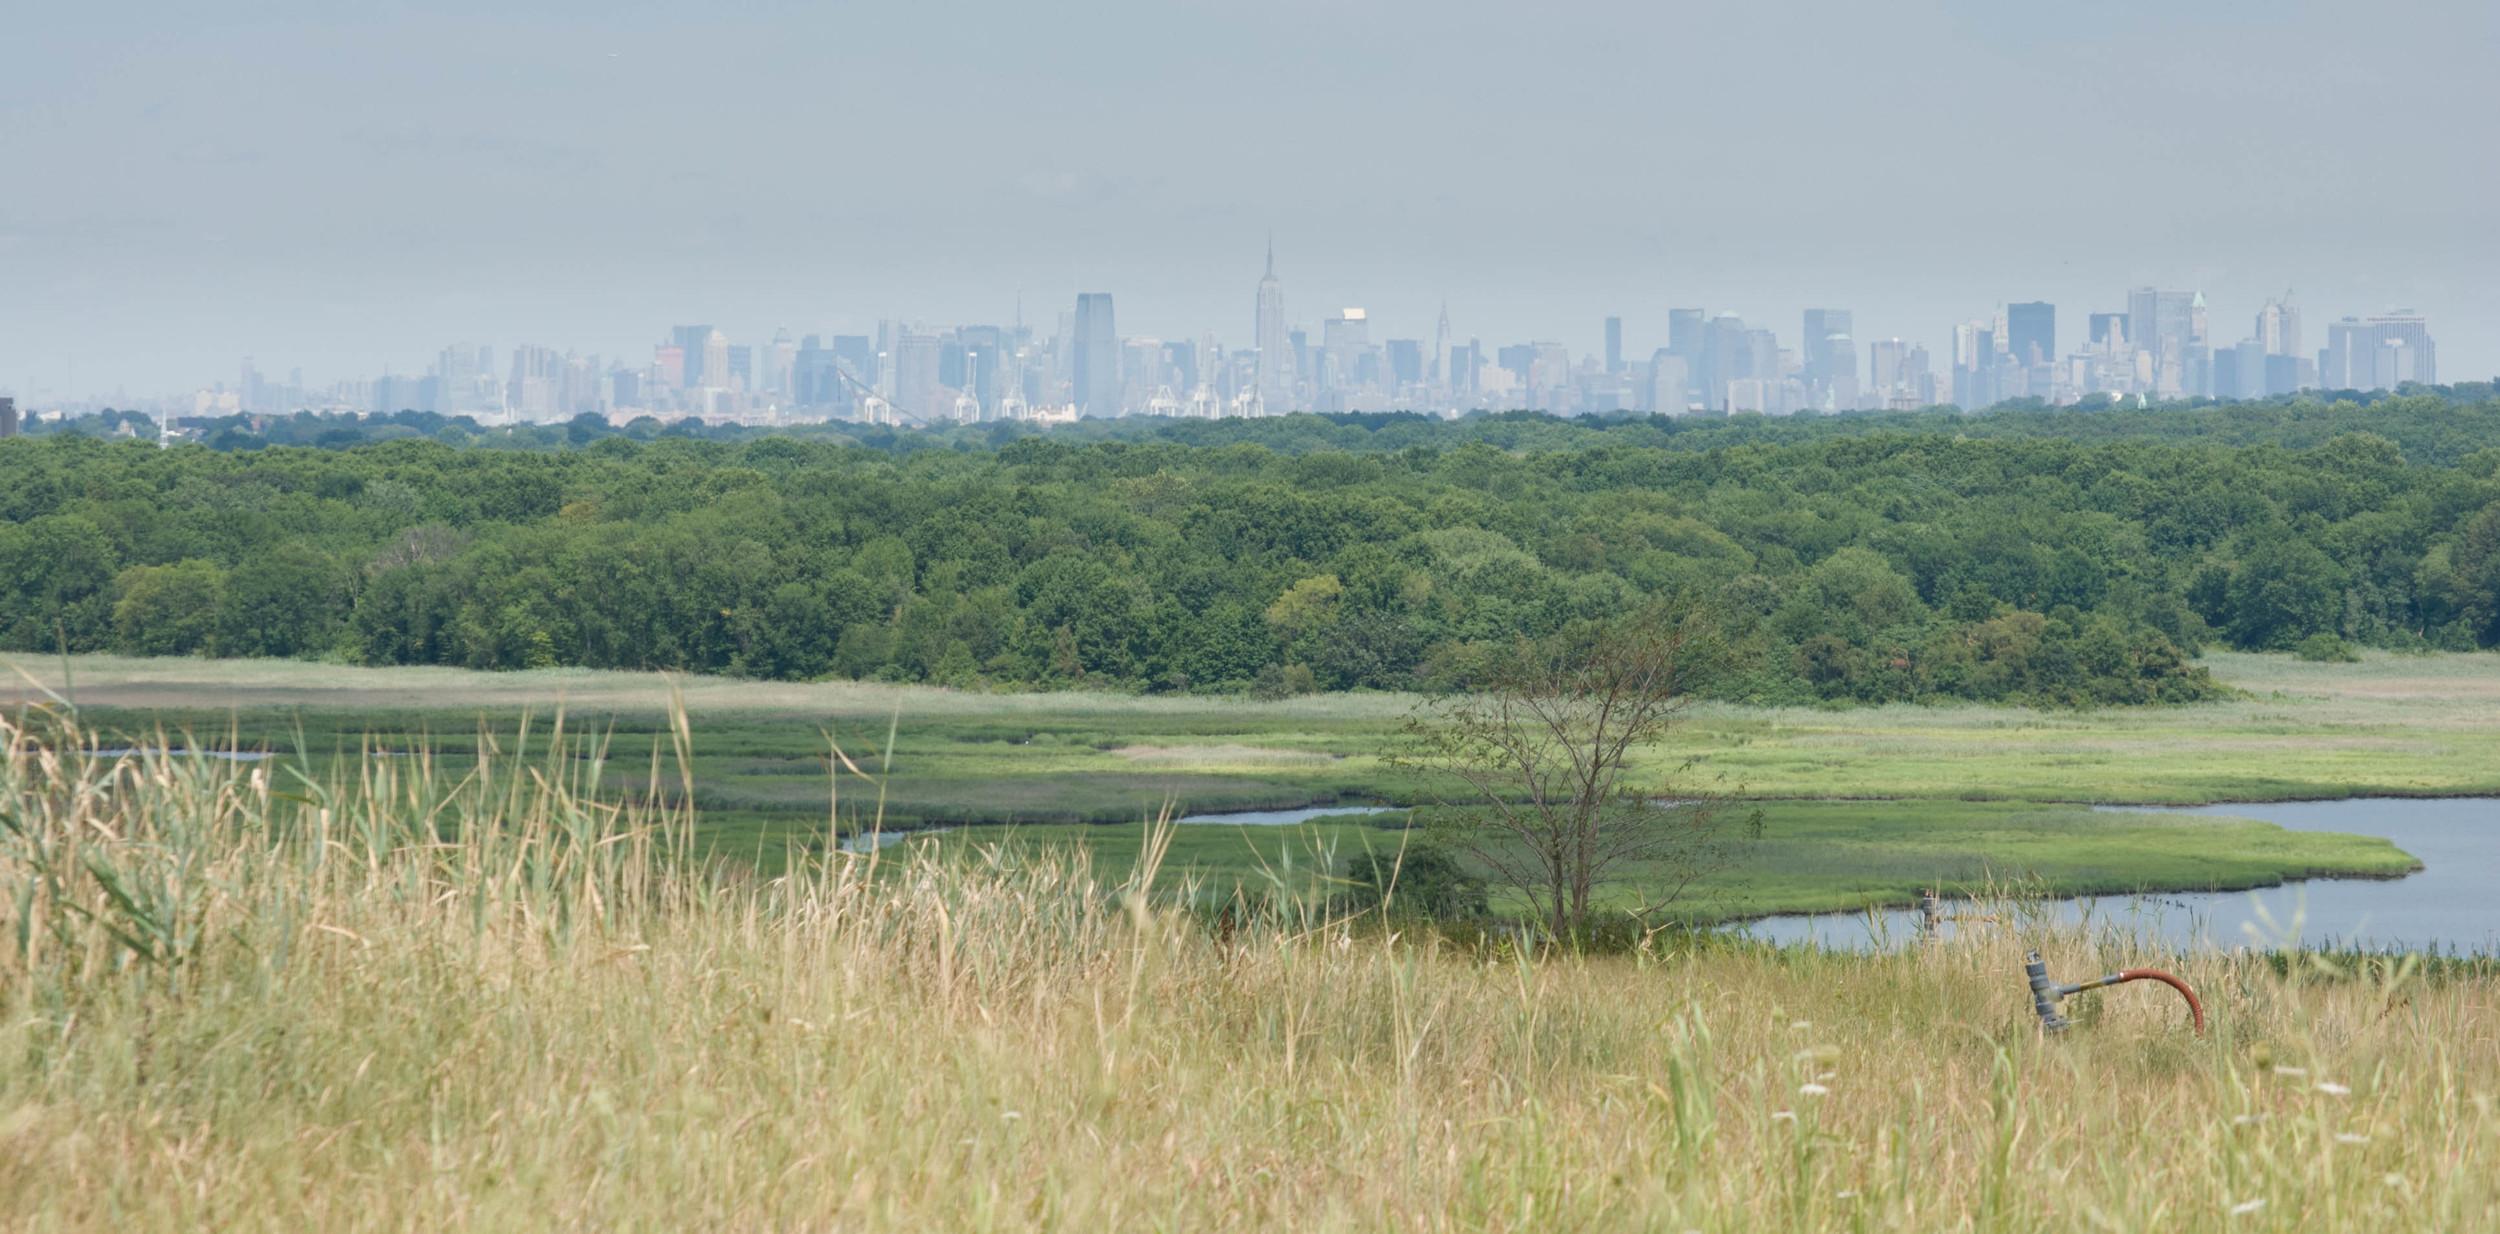 Freshkills Park and the Manhattan skyline. Photo by Kristine Paulus